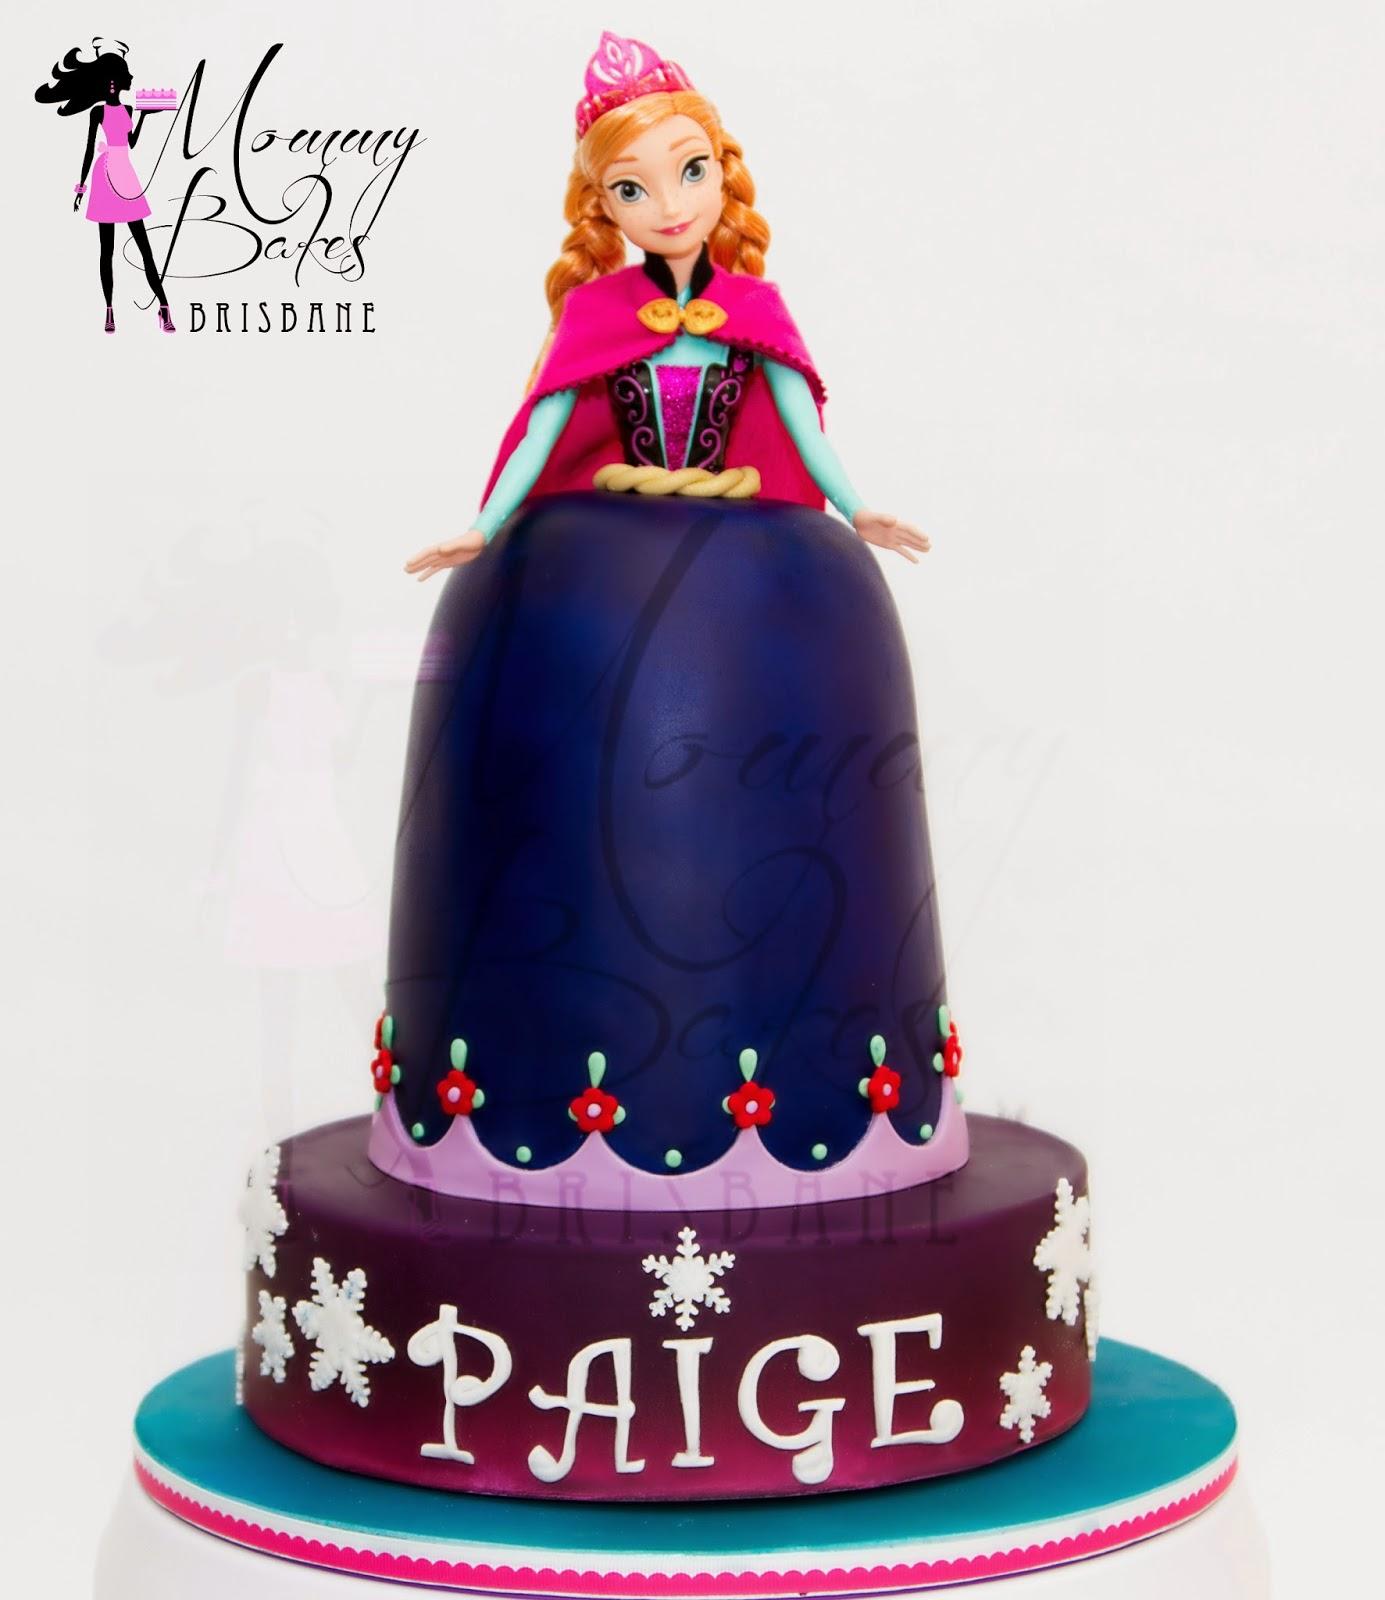 MommyBakes-Brisbane: Princess Anna Doll Cake